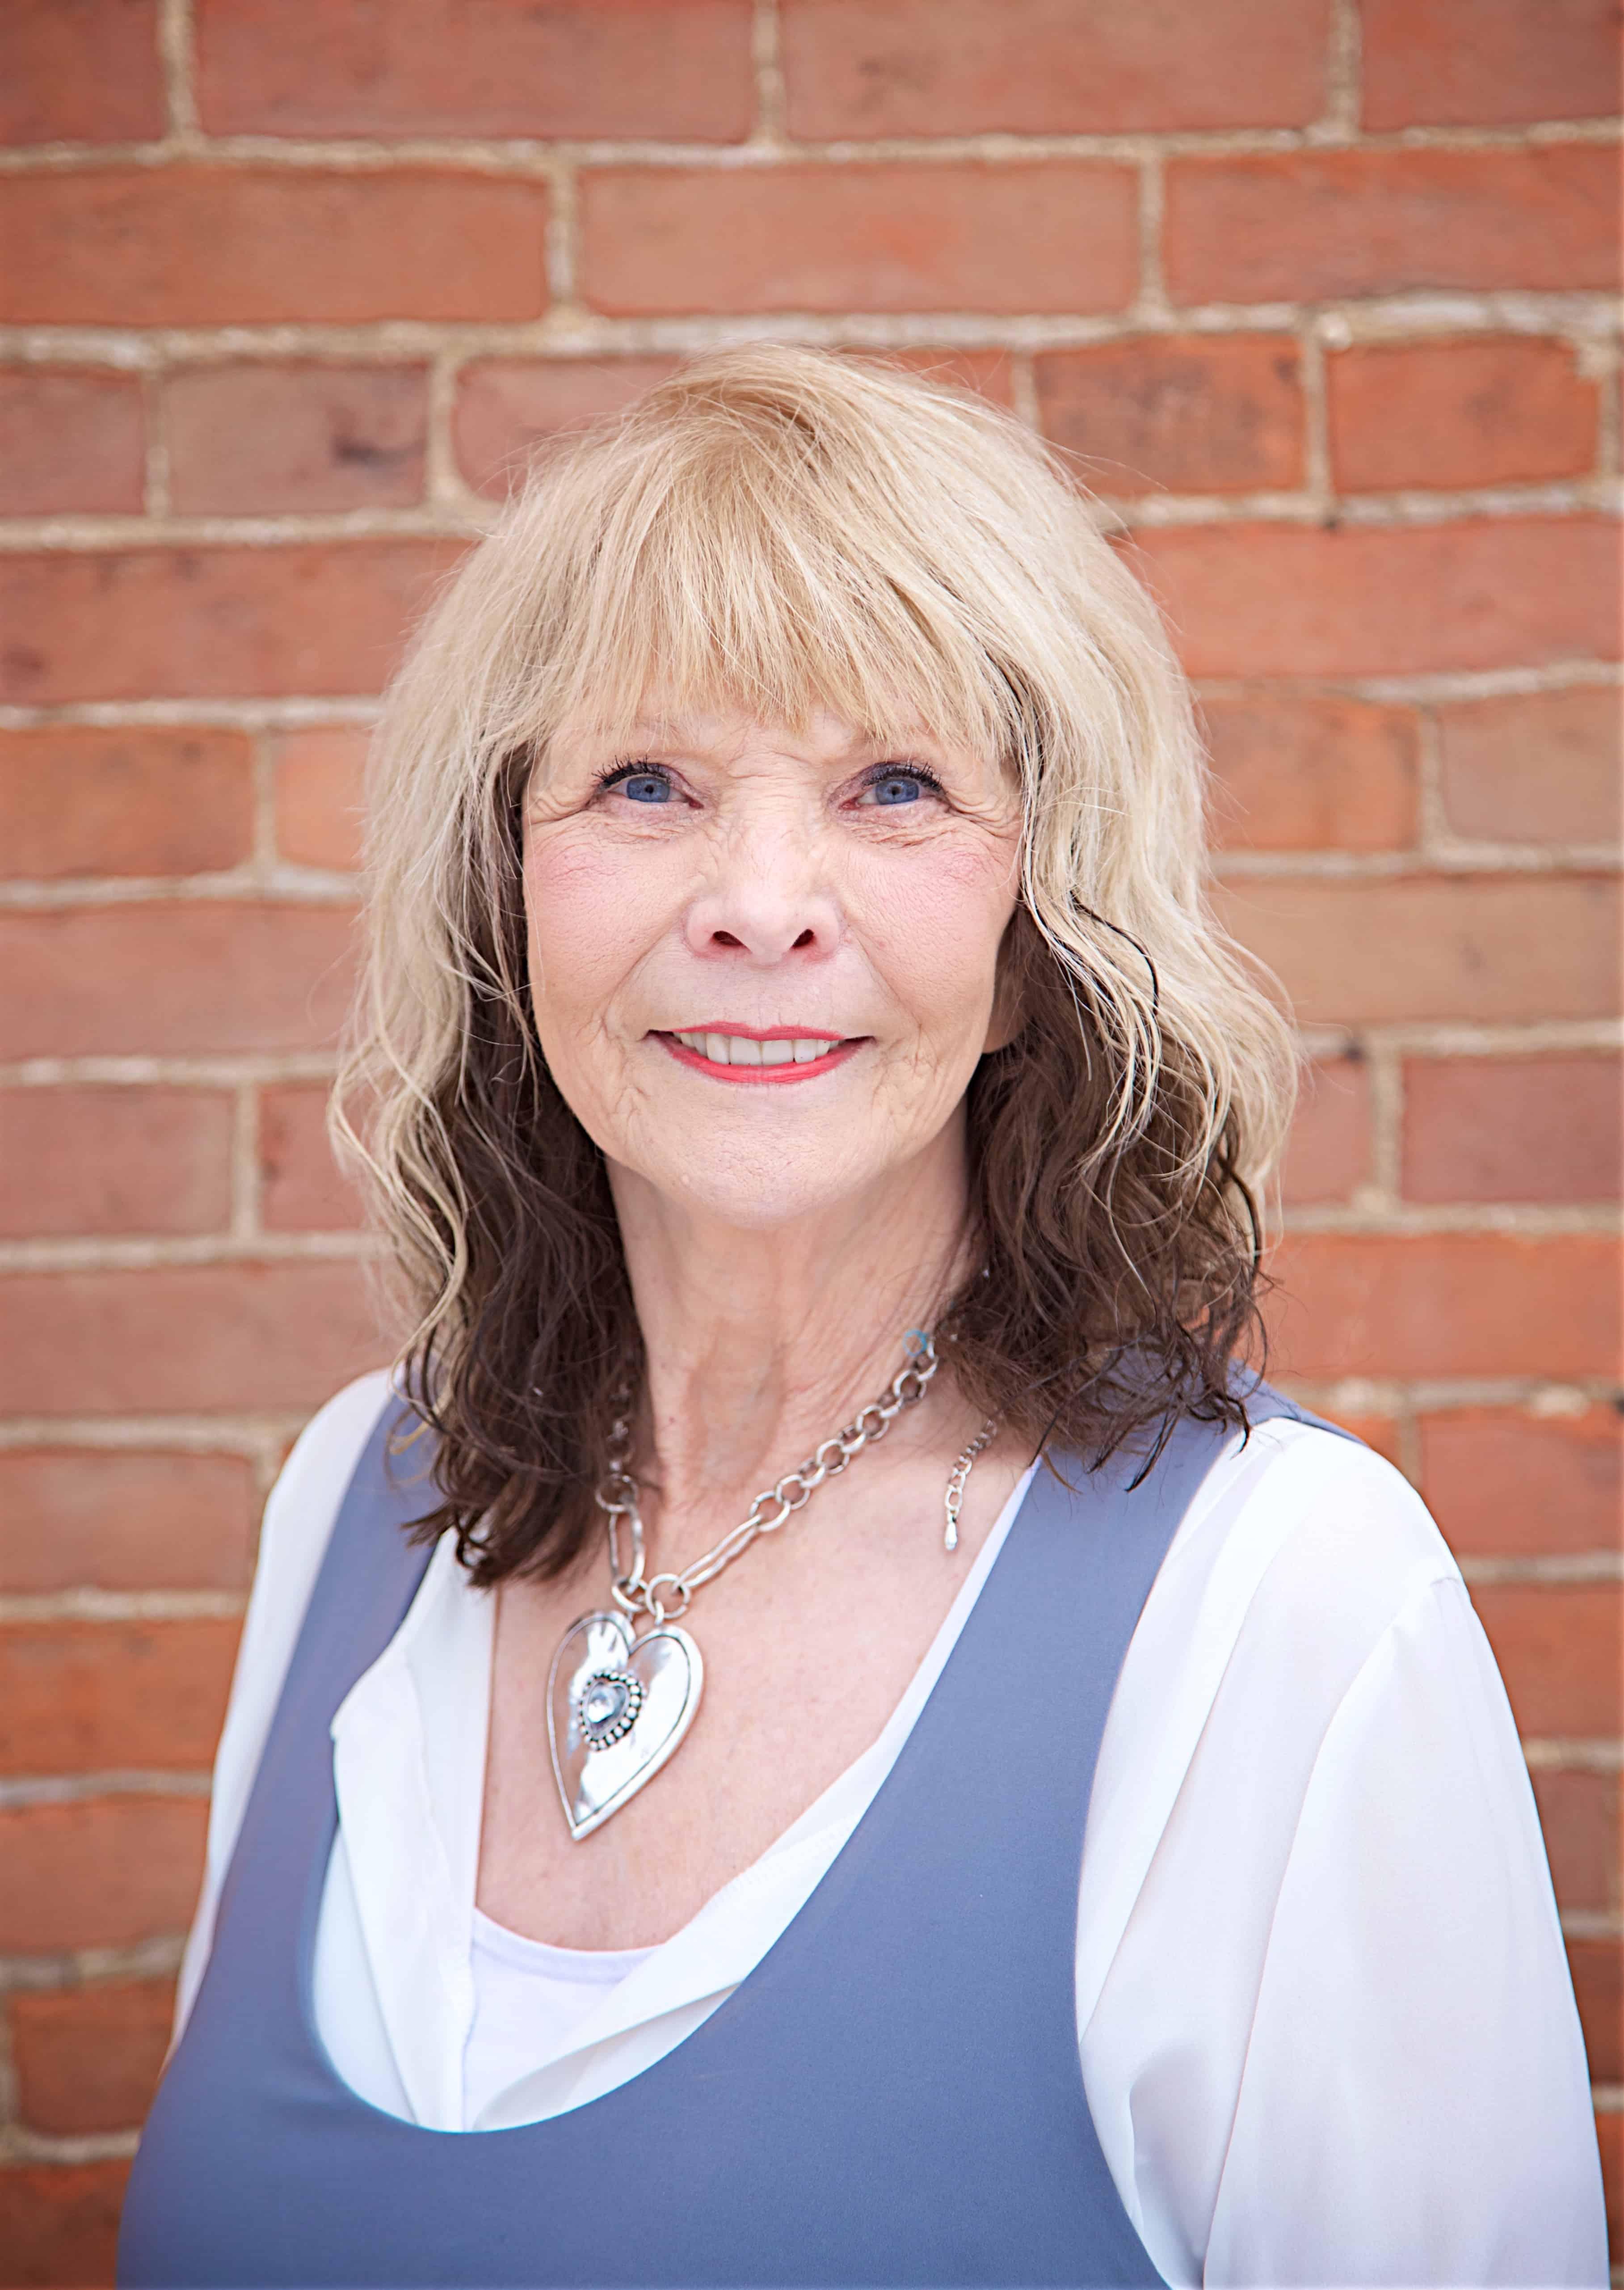 Pamela J. Heil, CADC